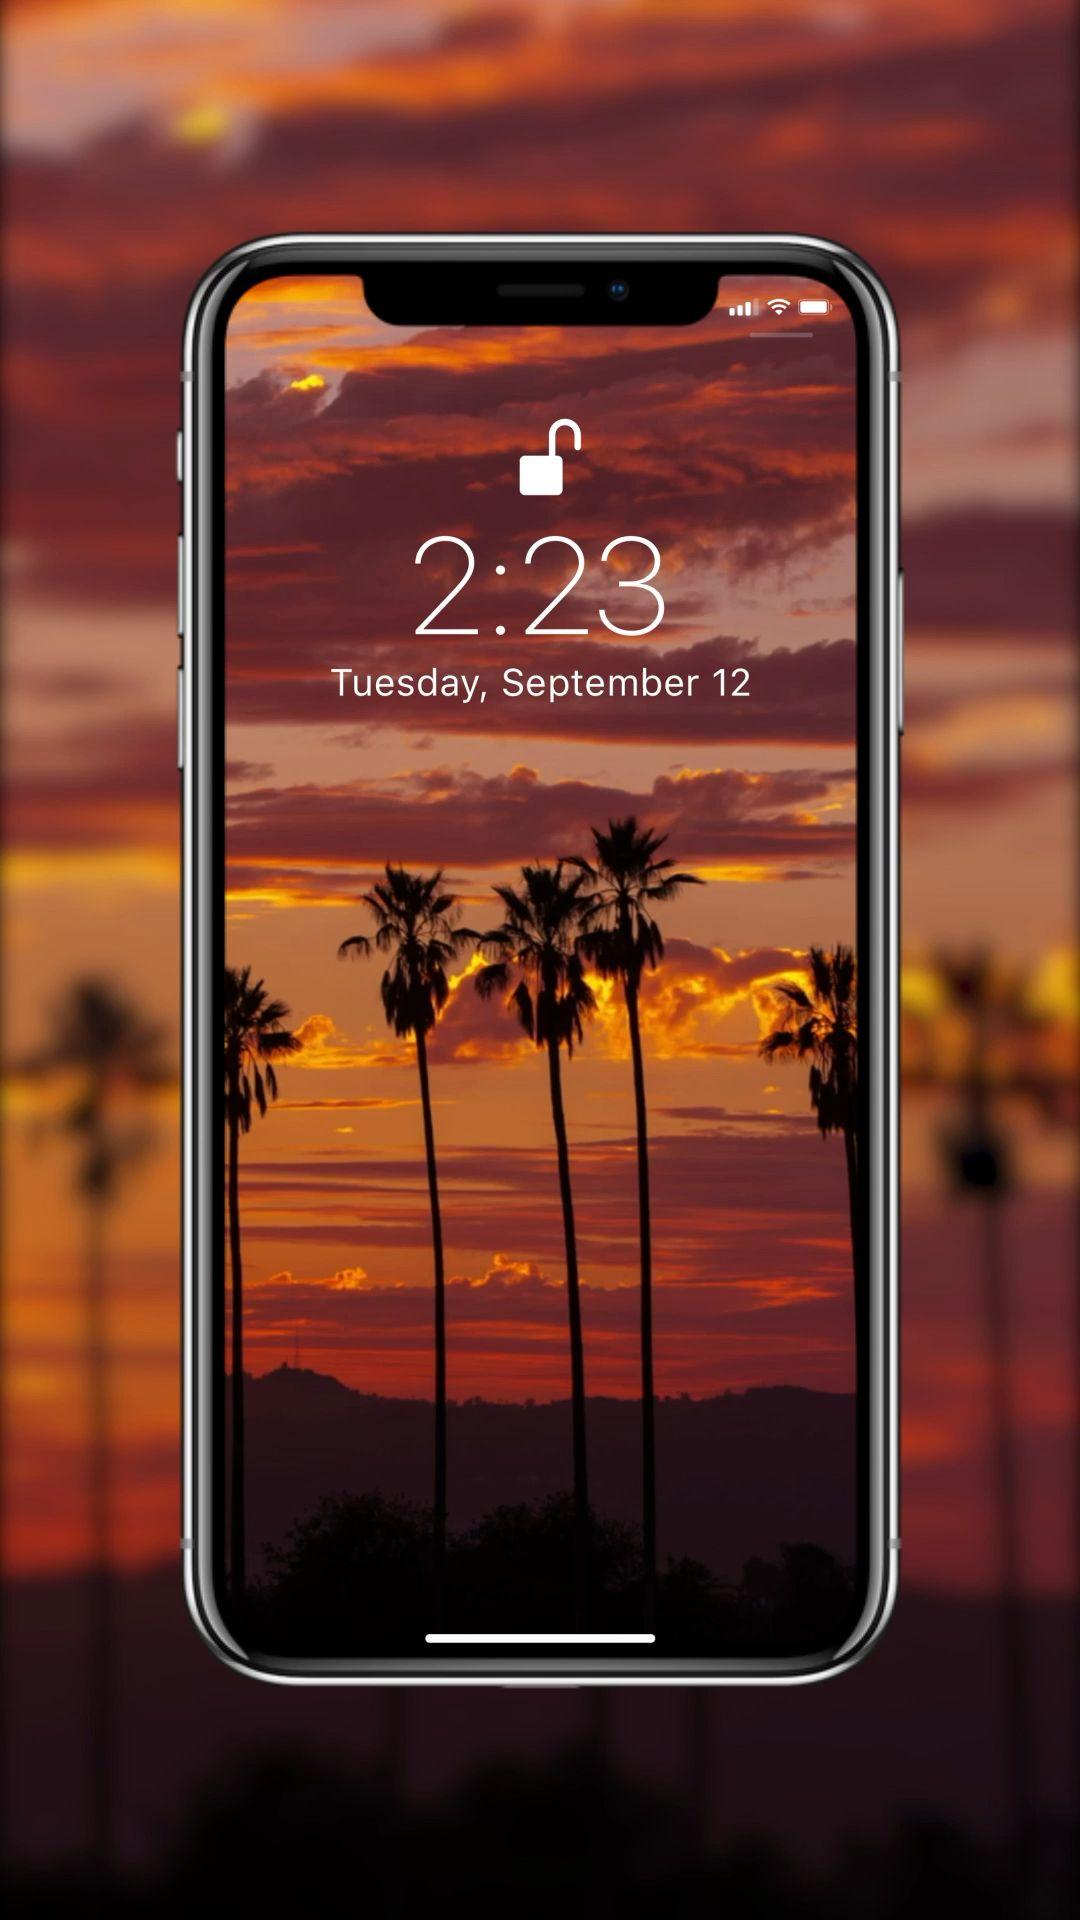 Nature Live Wallpaper Video Live Wallpaper Iphone Iphone Wallpaper Video Beach Wallpaper Iphone